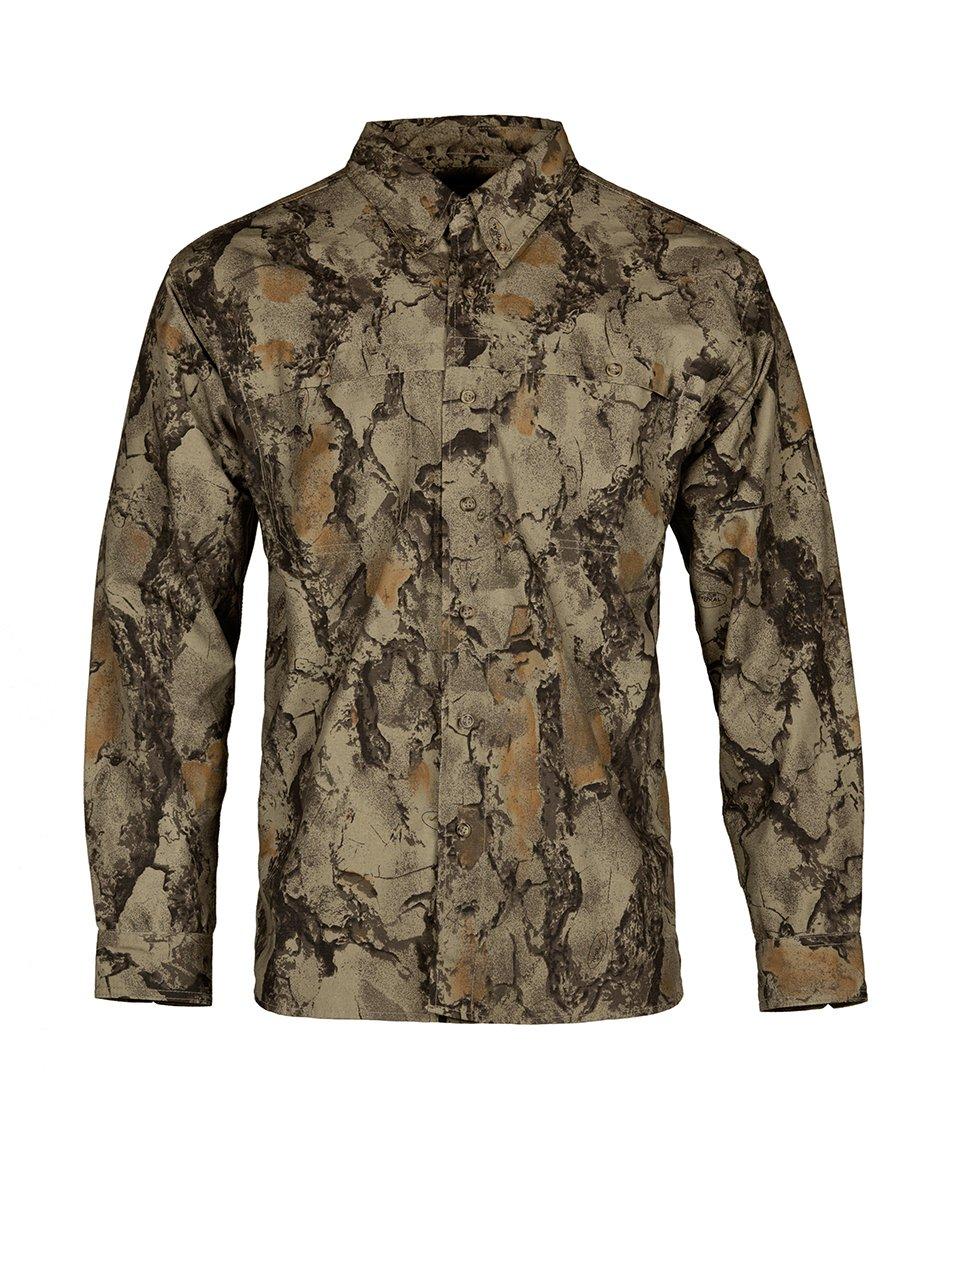 58f10309b36a1 Amazon.com : Natural Gear Tactical Bush Shirt, Camo Long Sleeve Shirt with  a 7-Button Front, Cotton/Poly Shirt, Hunting Clothe : Clothing